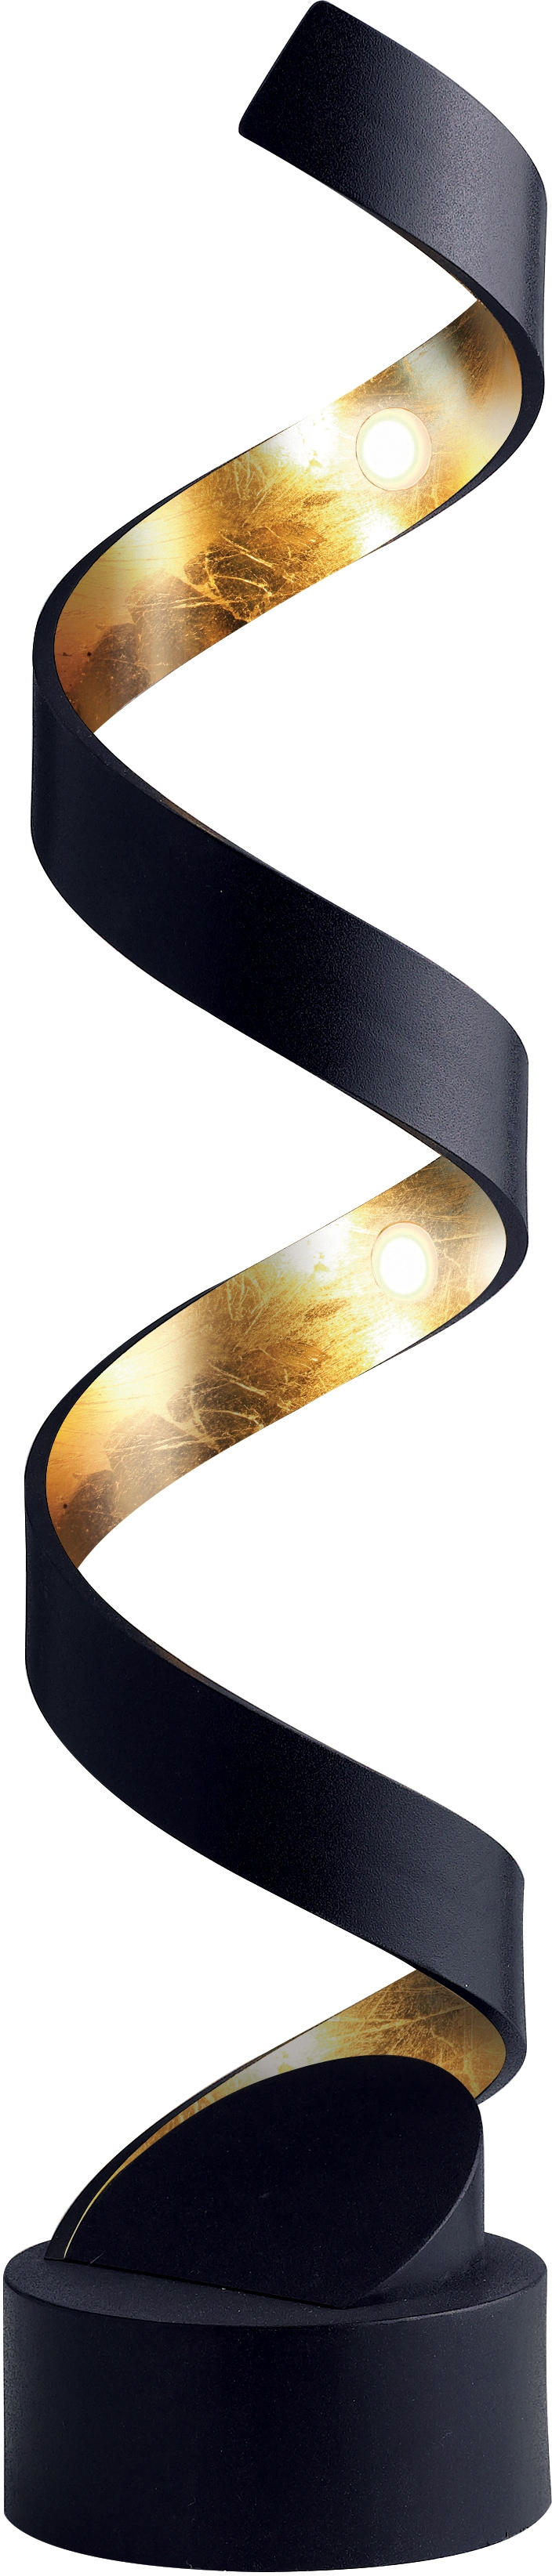 LUCE Design LED Tischleuchte LED-HELIX-L4 NER, LED-Modul, 1 St., Warmweiß